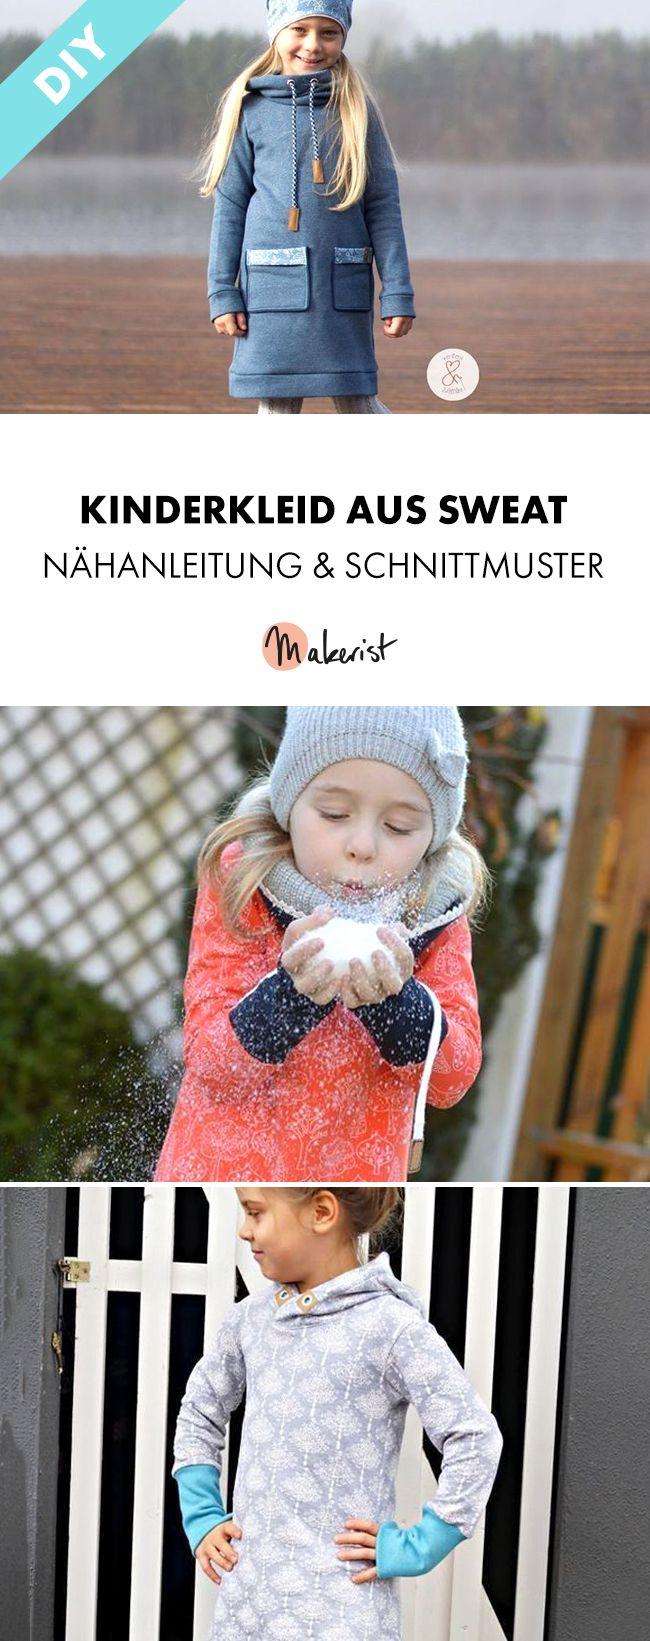 261 best Nähen für Kinder images on Pinterest   Nähideen ...